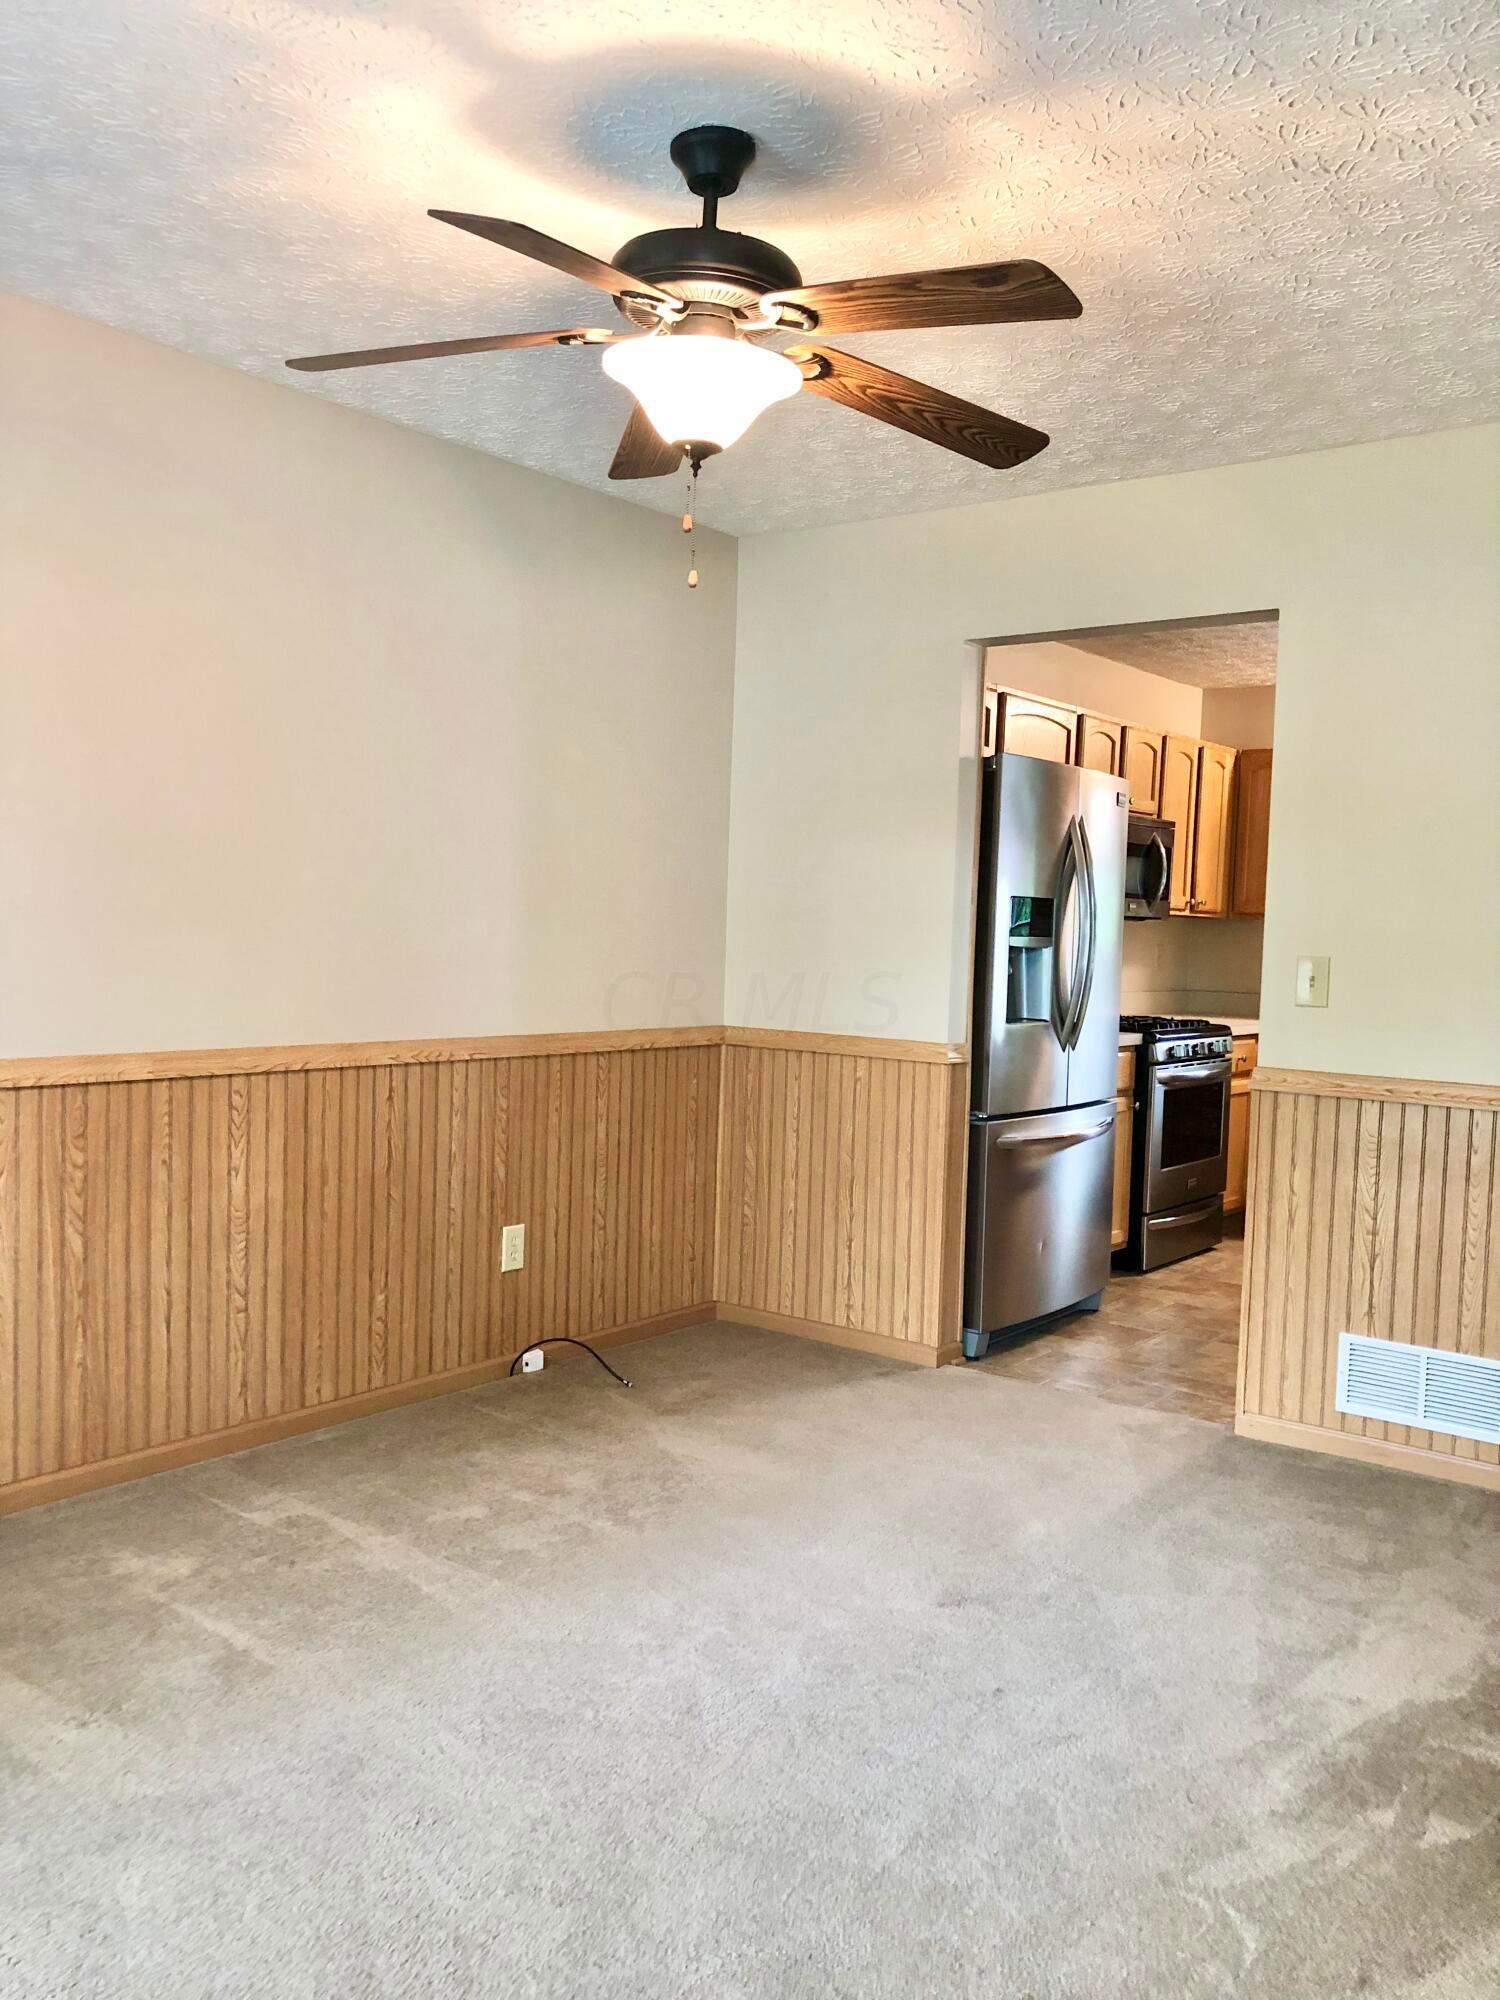 Formal dining or living room